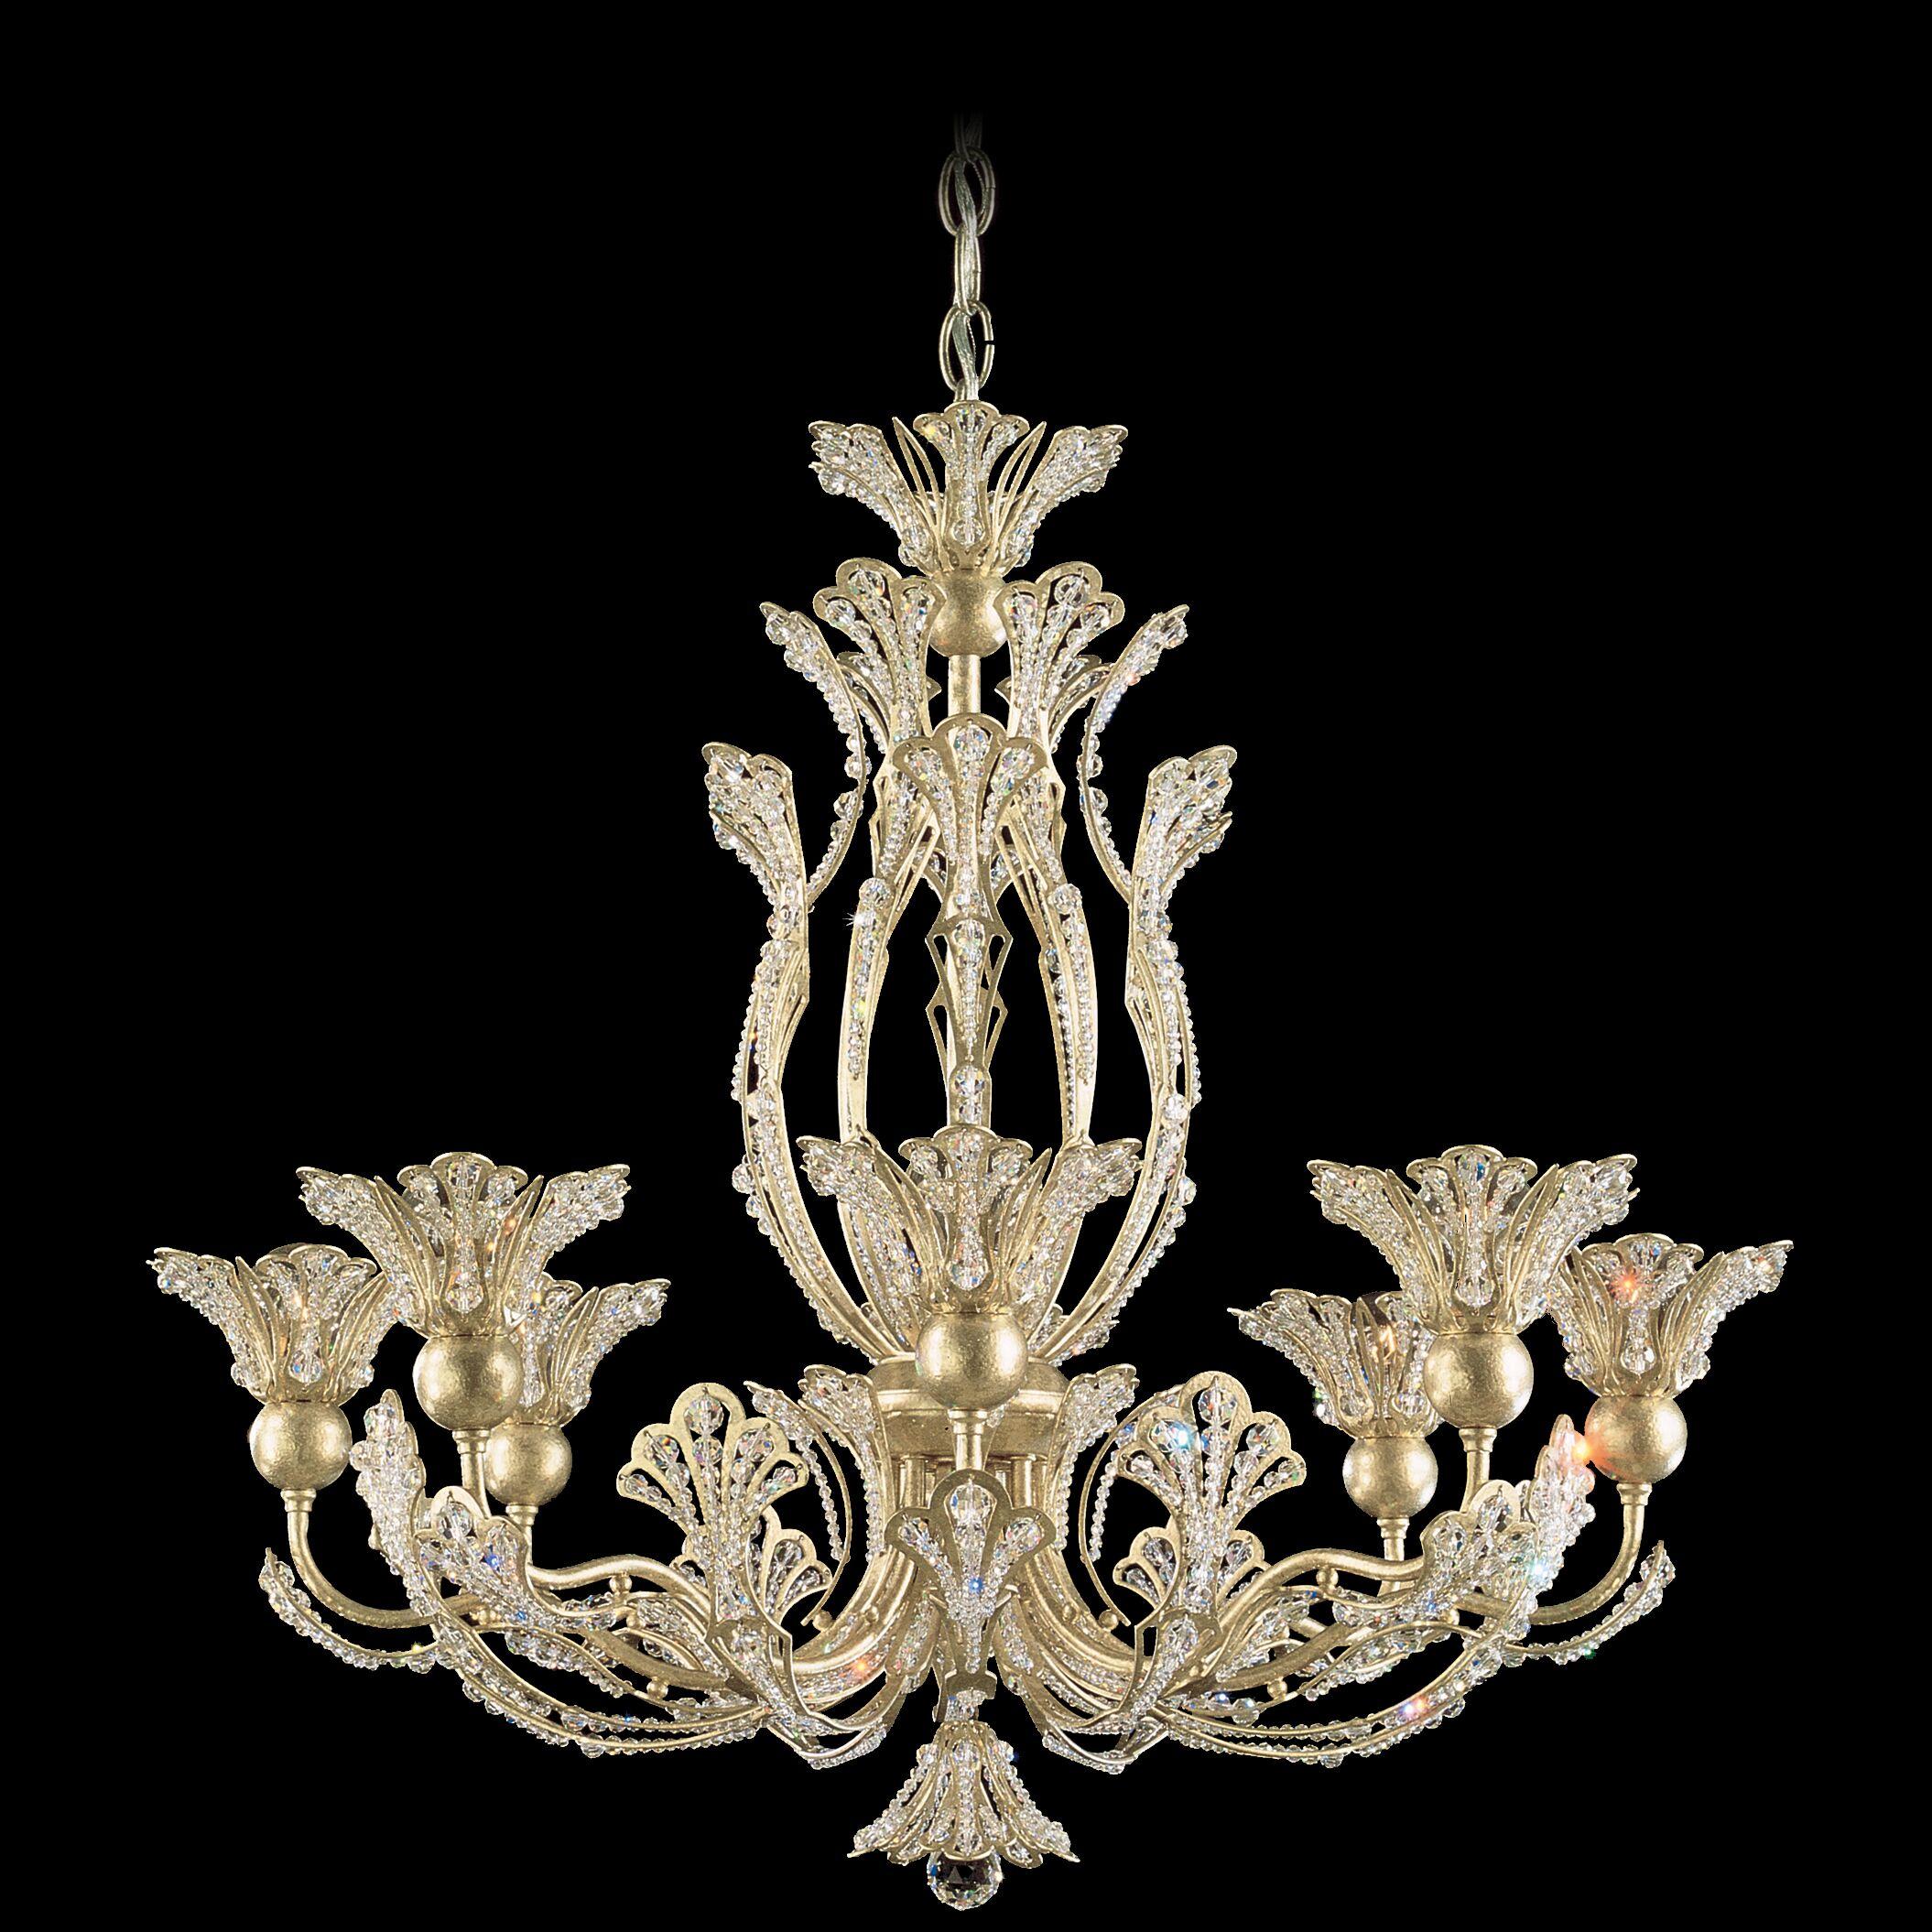 Rivendell 8-Light Chandelier Finish: Heirloom Bronze, Crystal Color: Spectra Crystal Clear